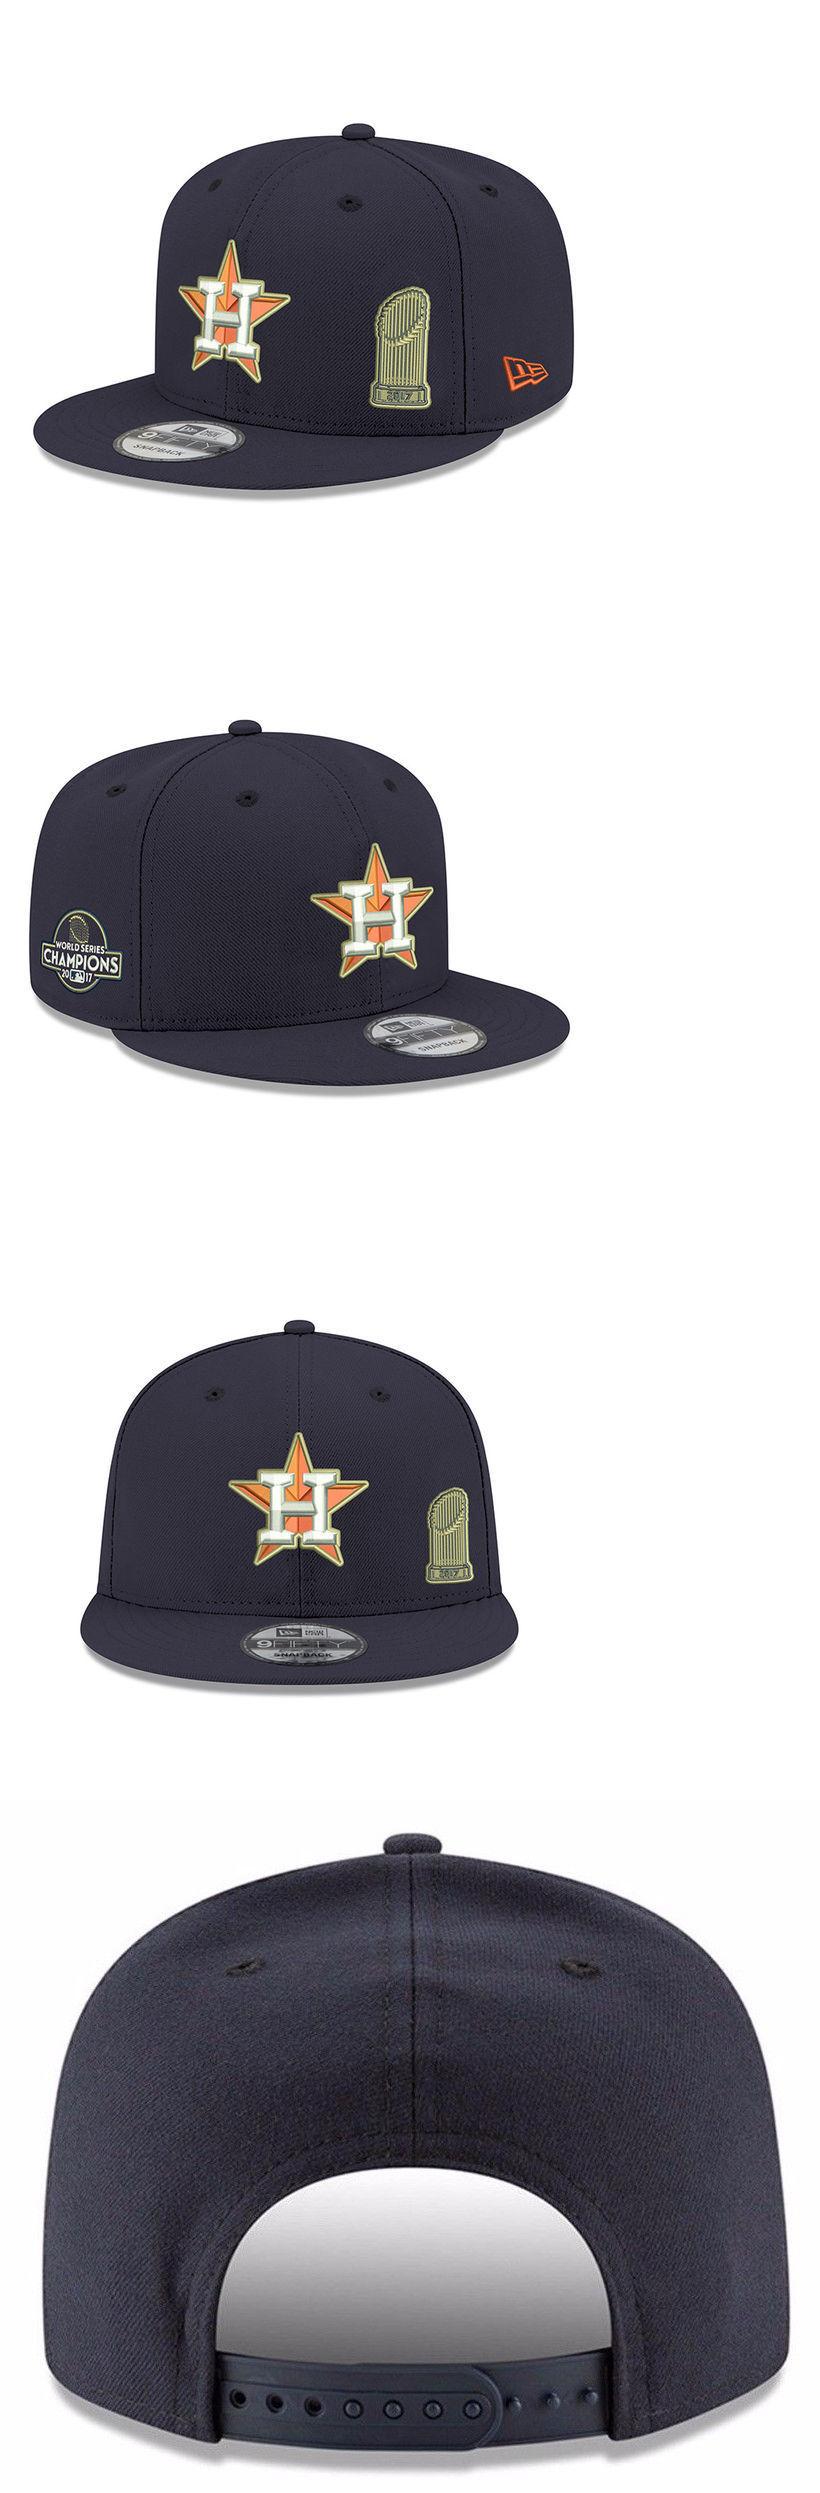 b0287511d72ff Baseball-MLB 24410  Houston Astros New Era World Series Champions Trophy  Patch 950 Snapback